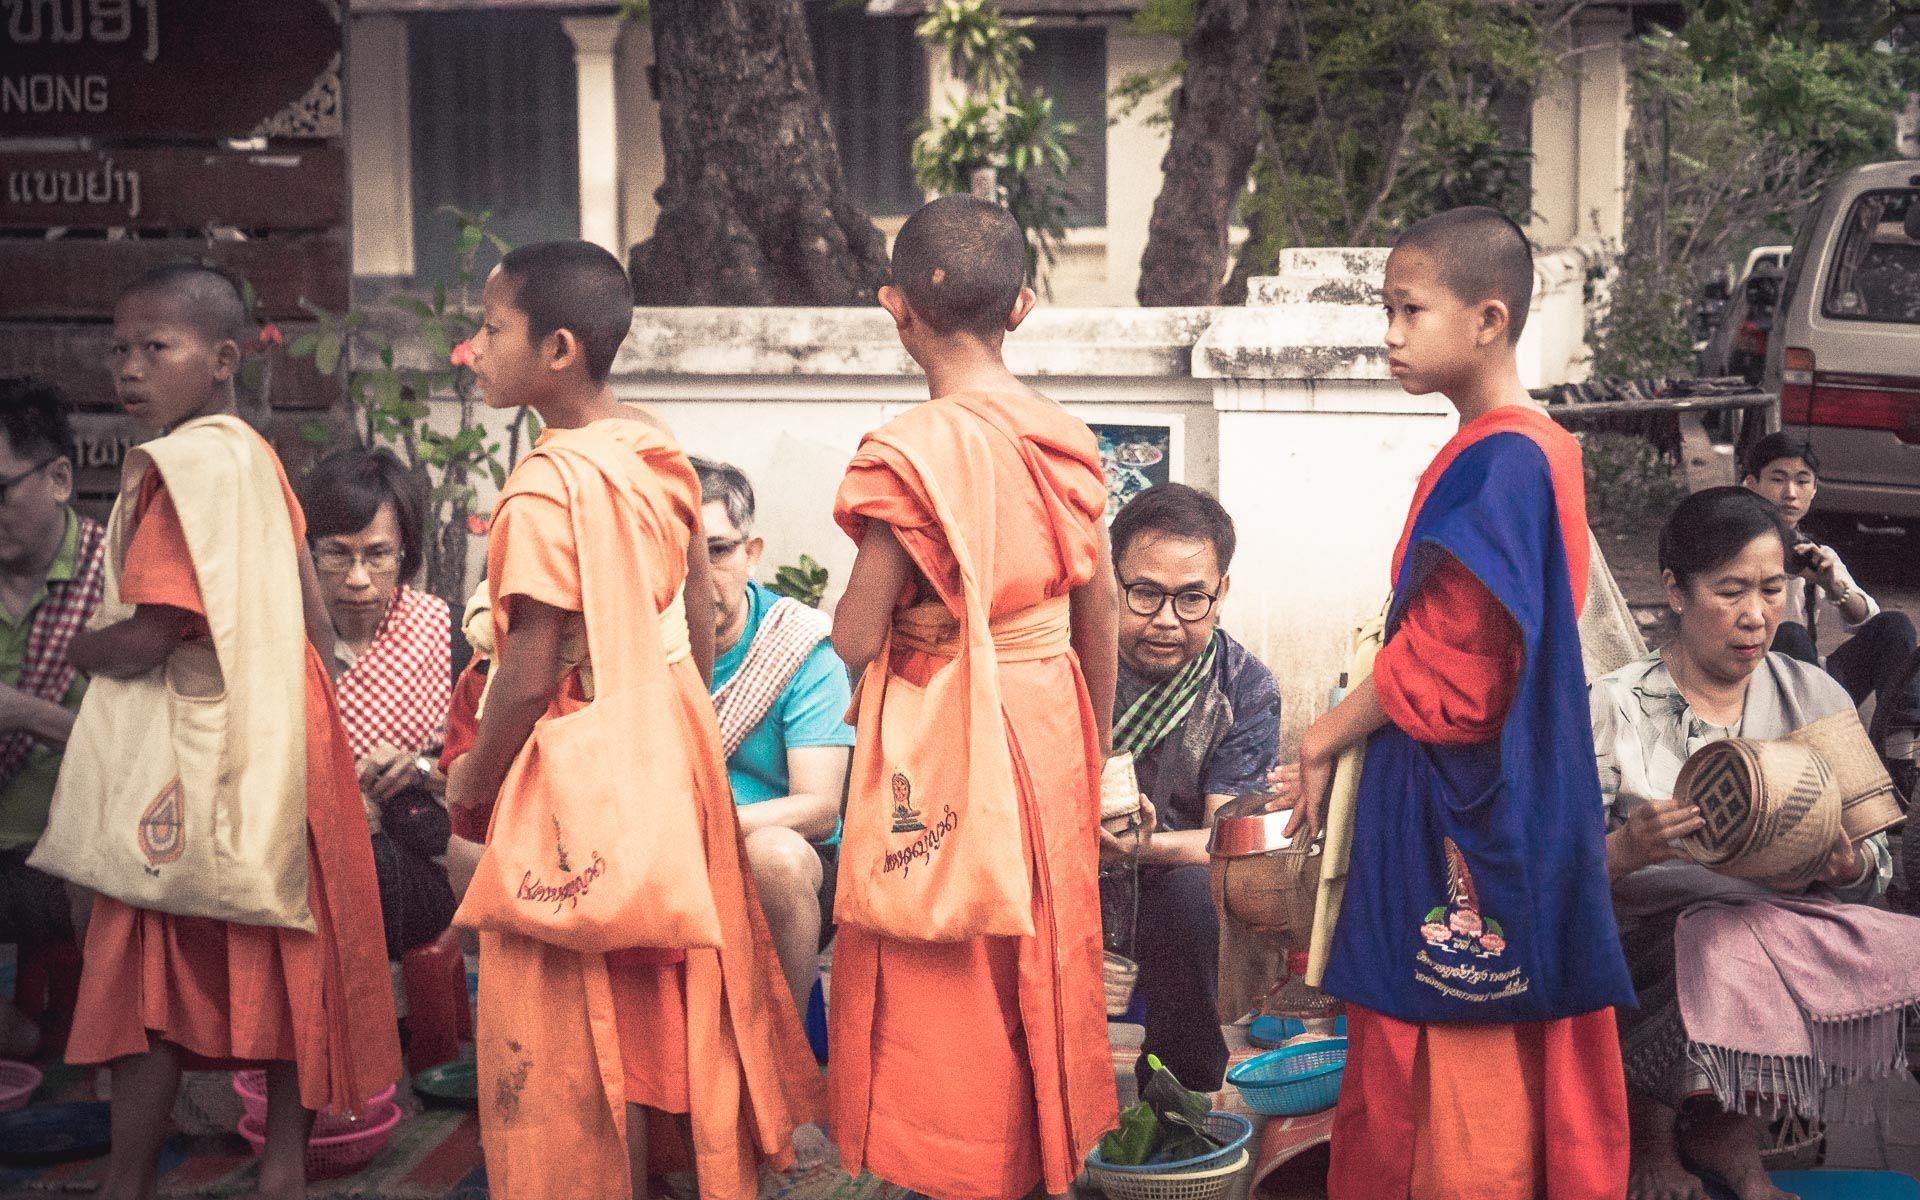 Lesvoyageuses-voyage-laos-luang-prabang-ceremonie-offrandes-8